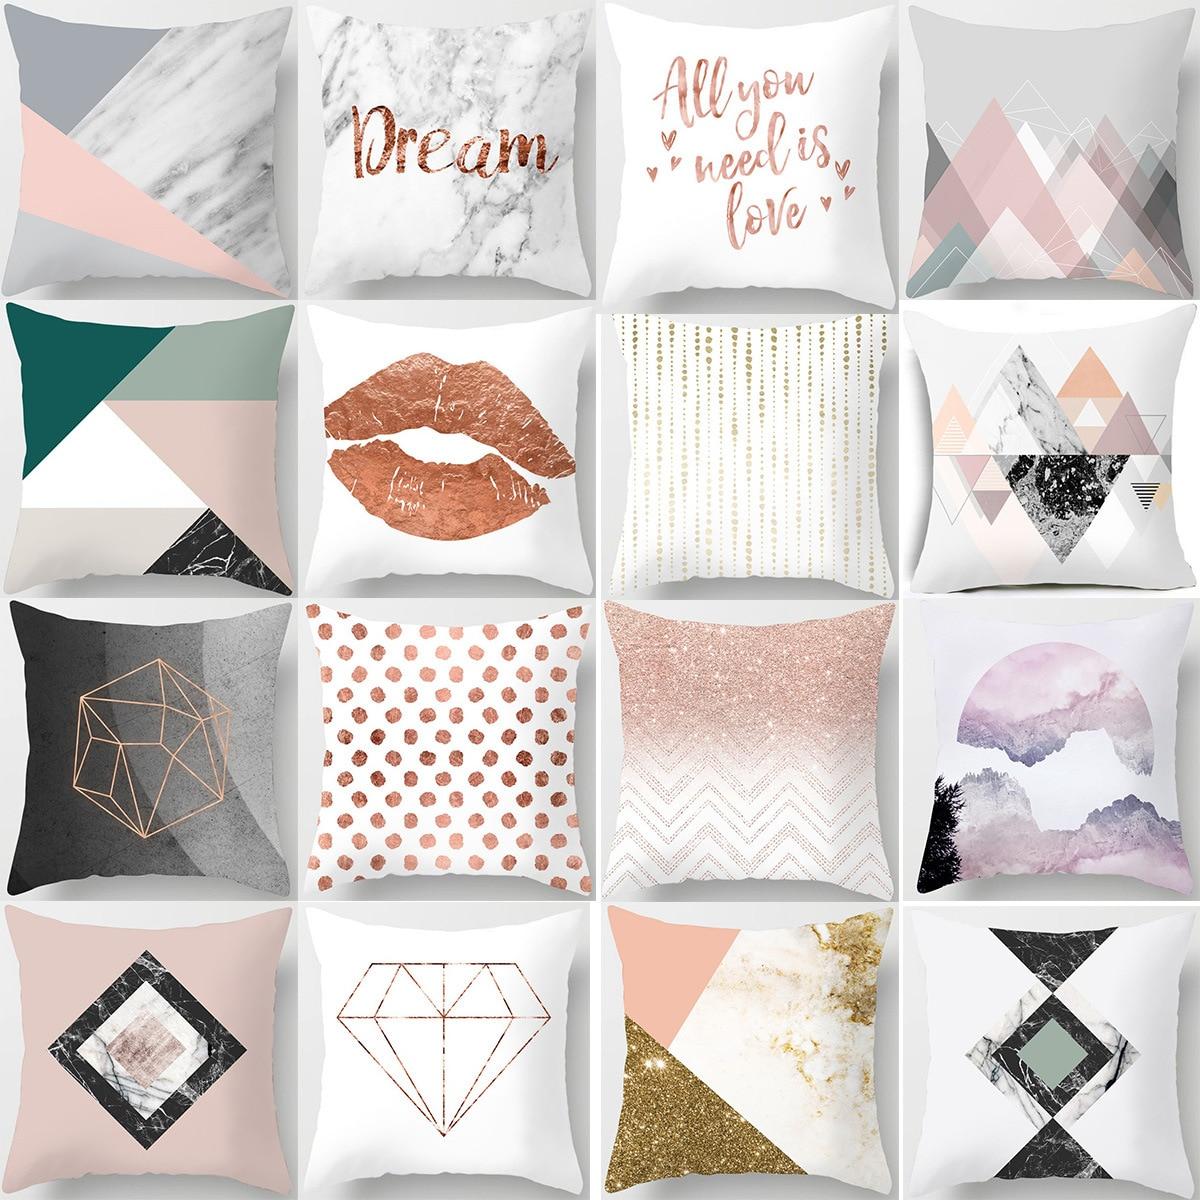 Nordic Simple Pink Marble Geometric Cushion Cover Peach Velvet Decorative Throw Pillowcase Home Decor Living Room Decoration-in Cushion Cover from Home & Garden